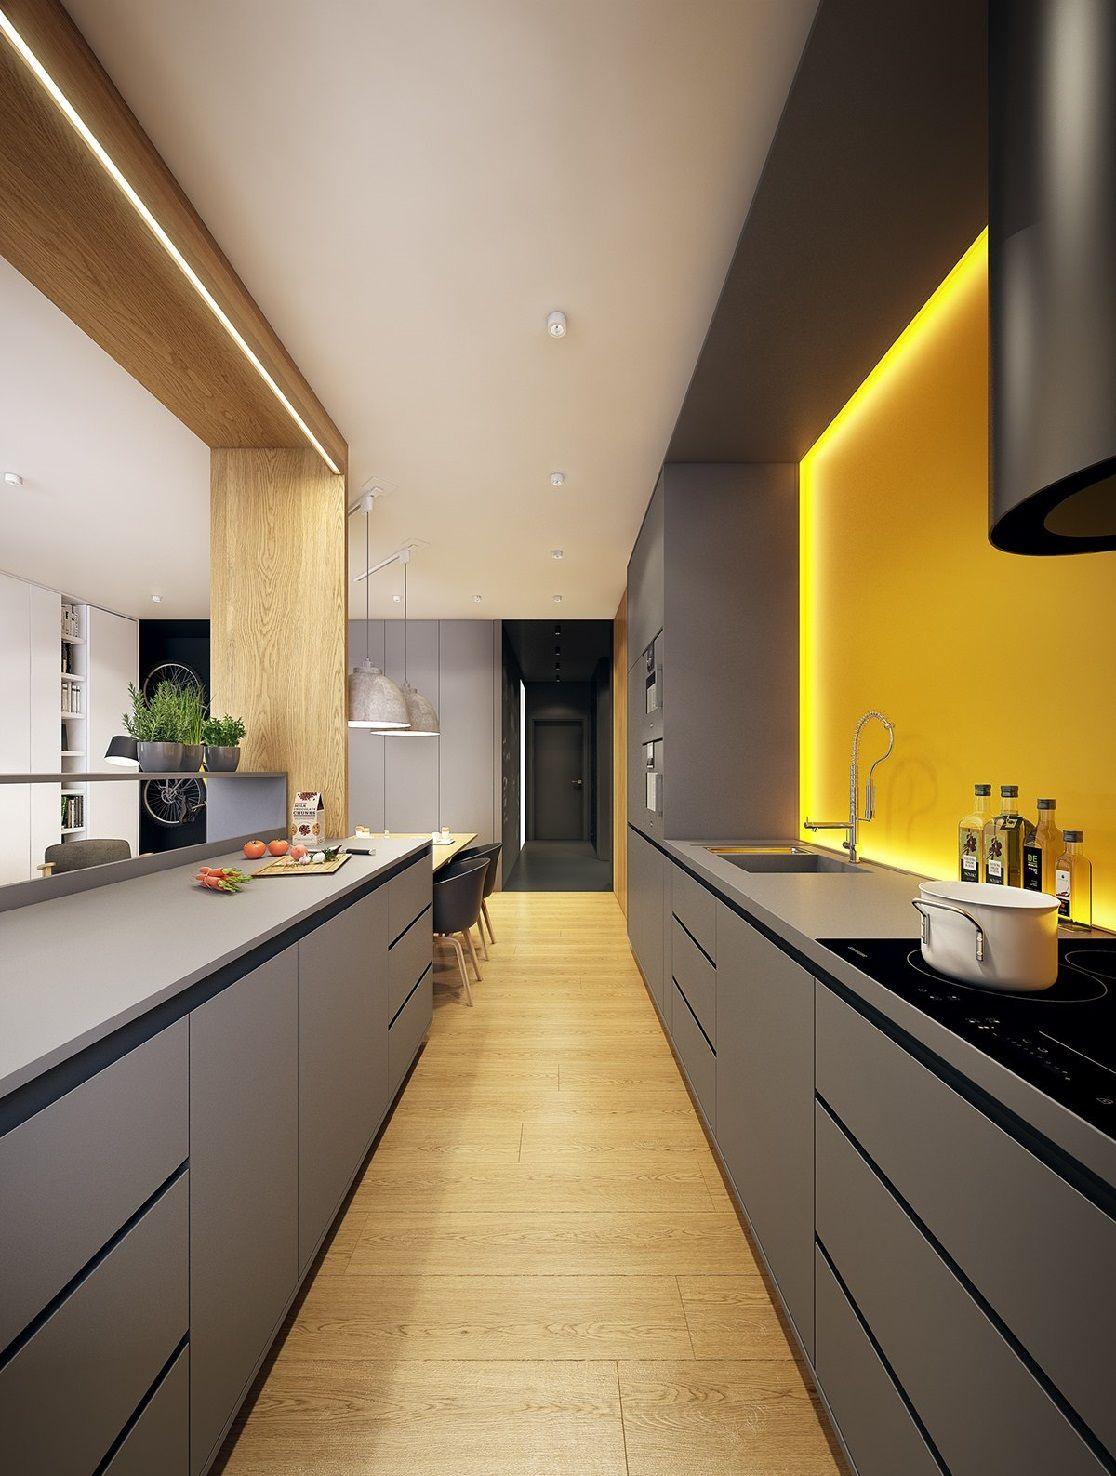 Desain Dapur Minimalis Bentuk Lurus Desain Dapur Minimalis